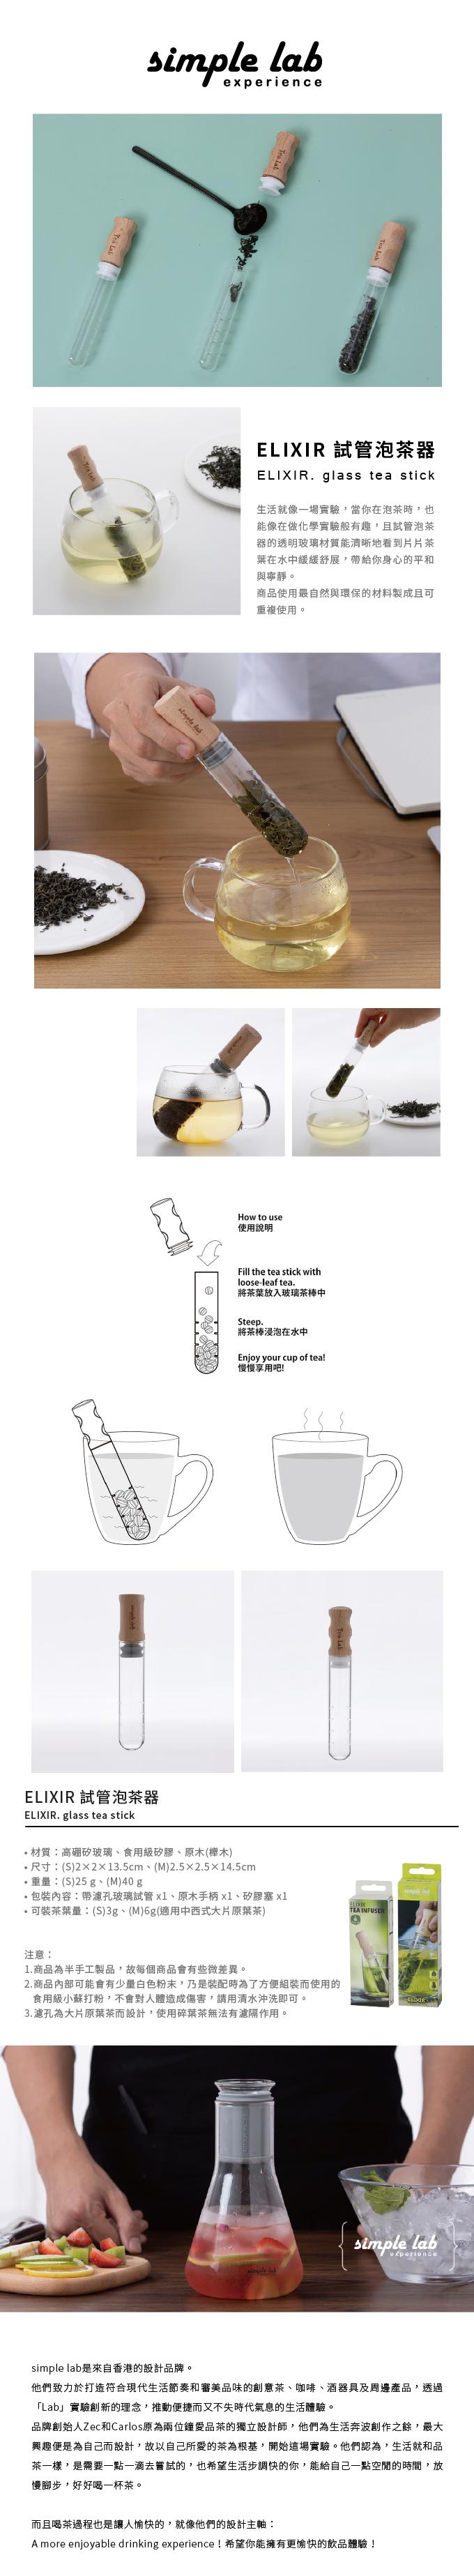 SIMPLE LAB|ELIXIR 試管泡茶器M